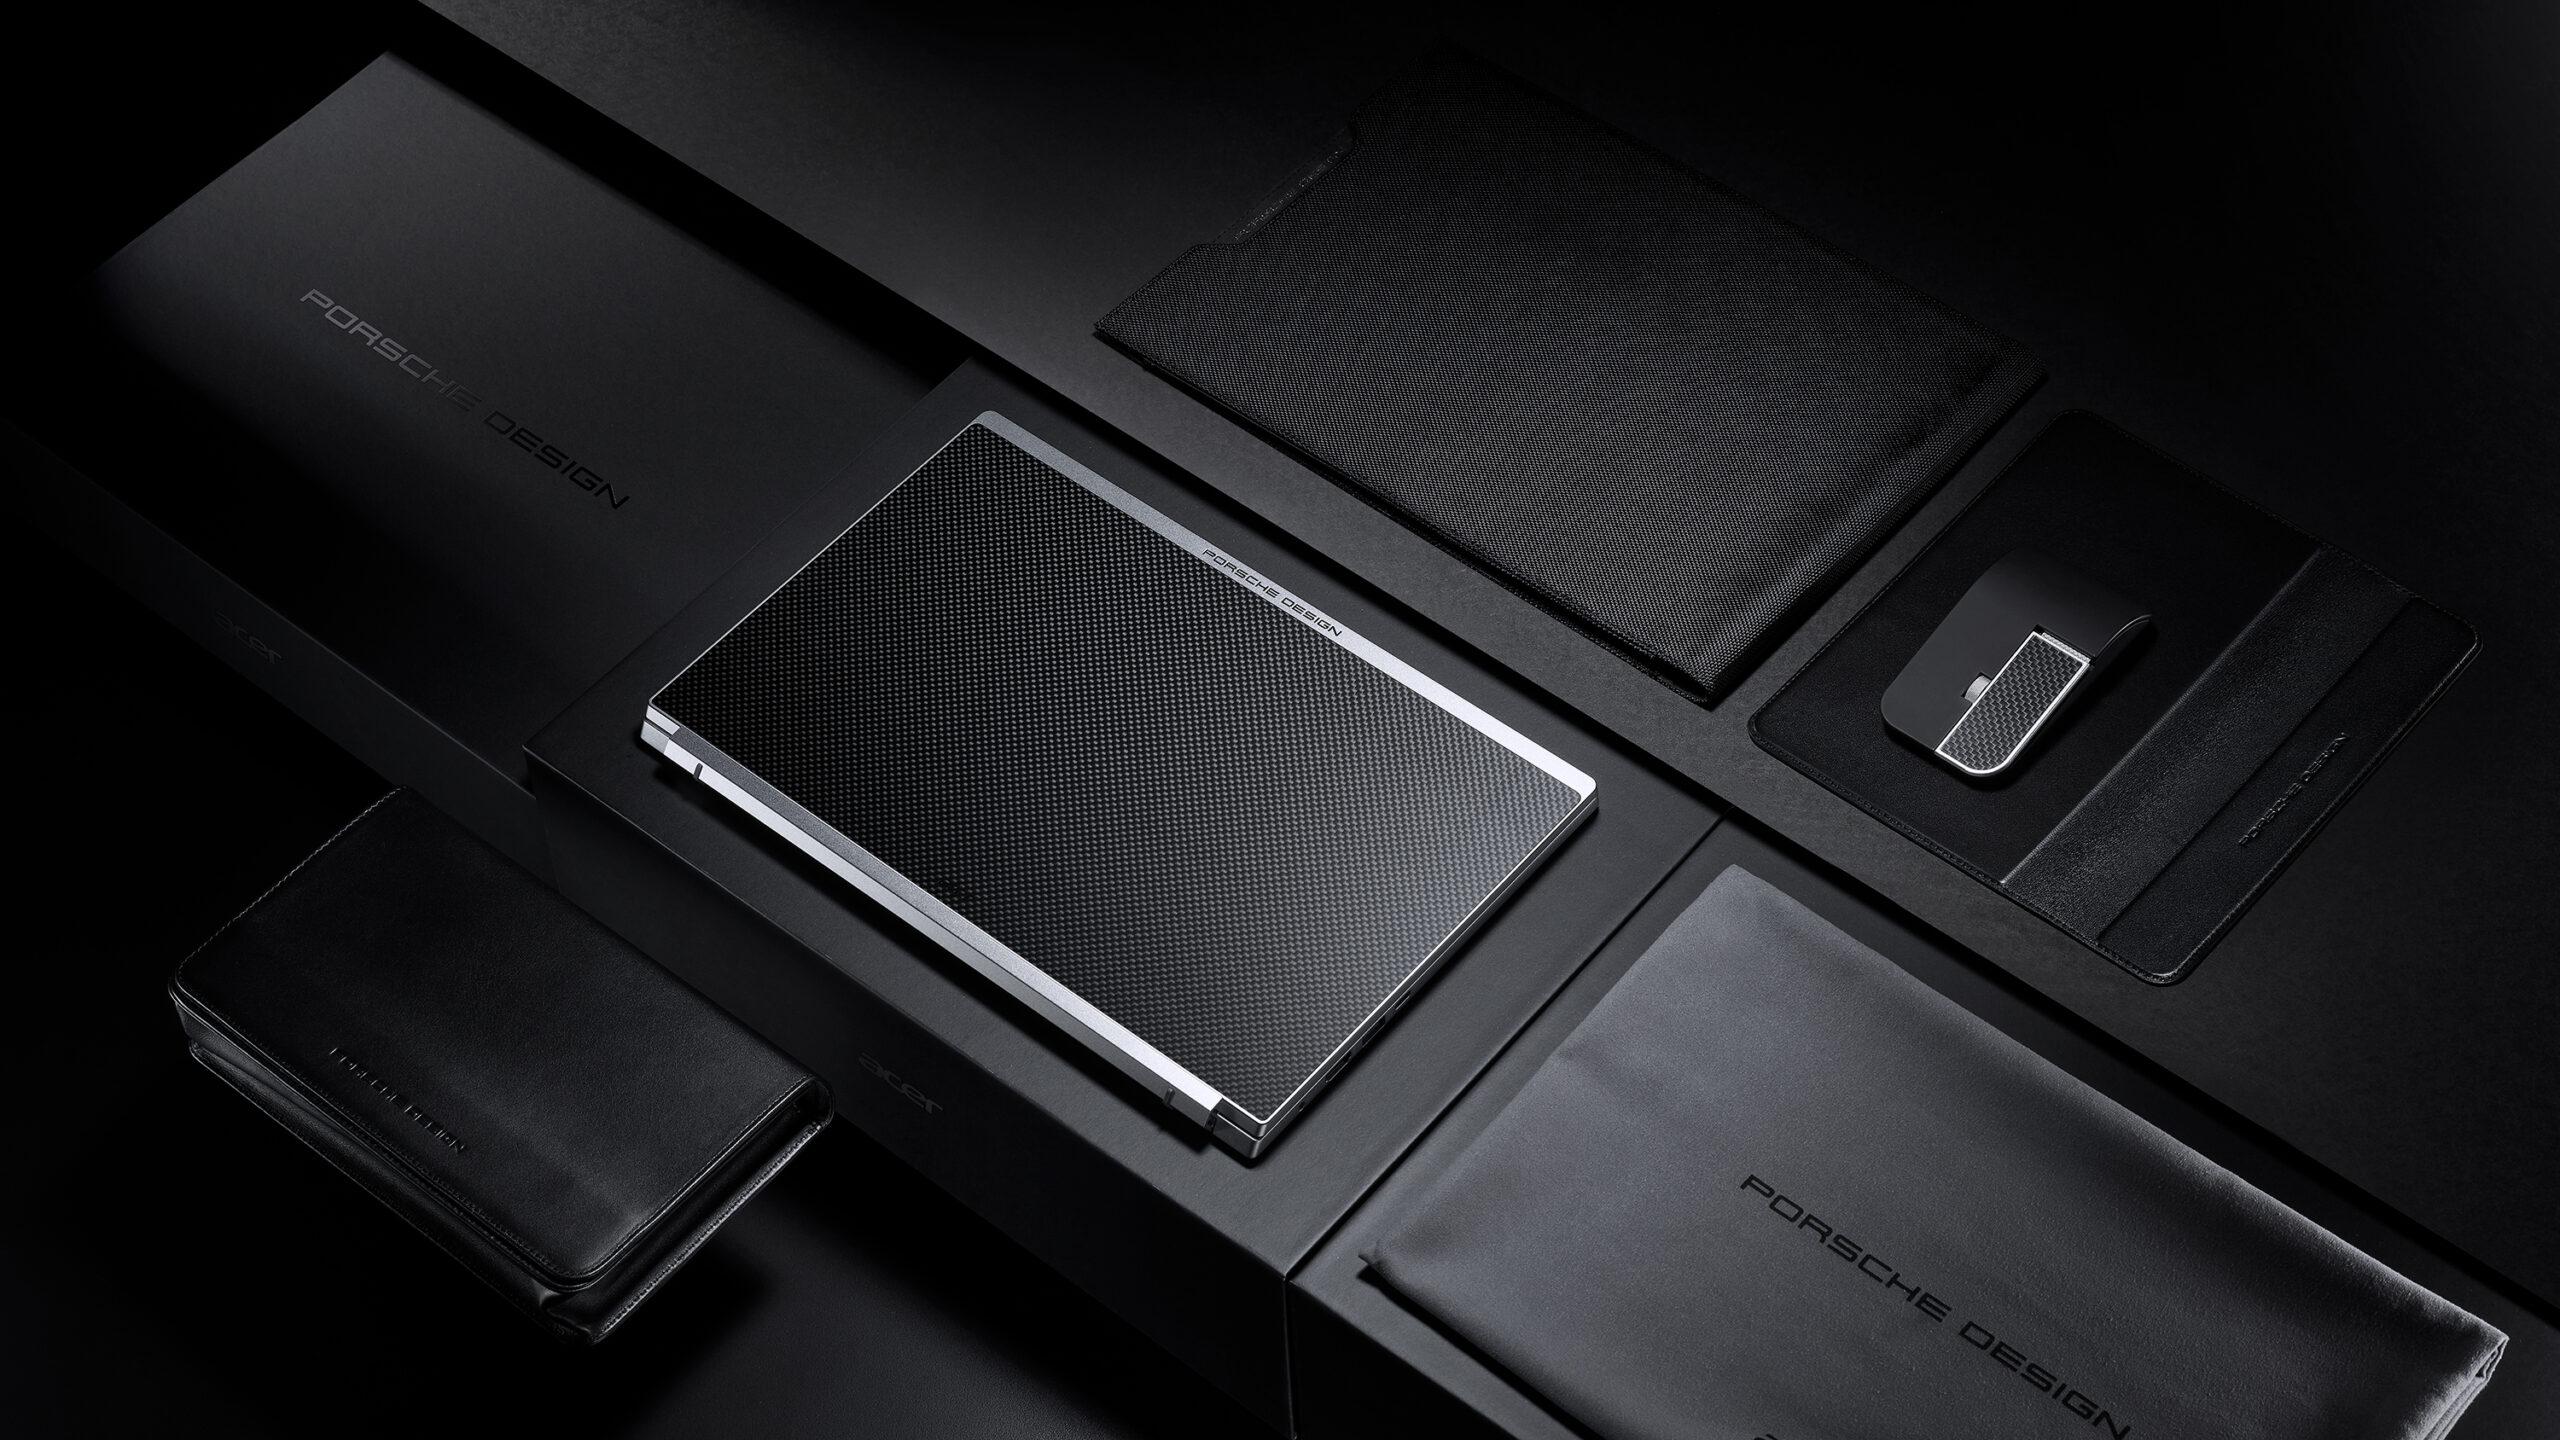 High End Elegance: The Porsche Design Acer Book RS 5